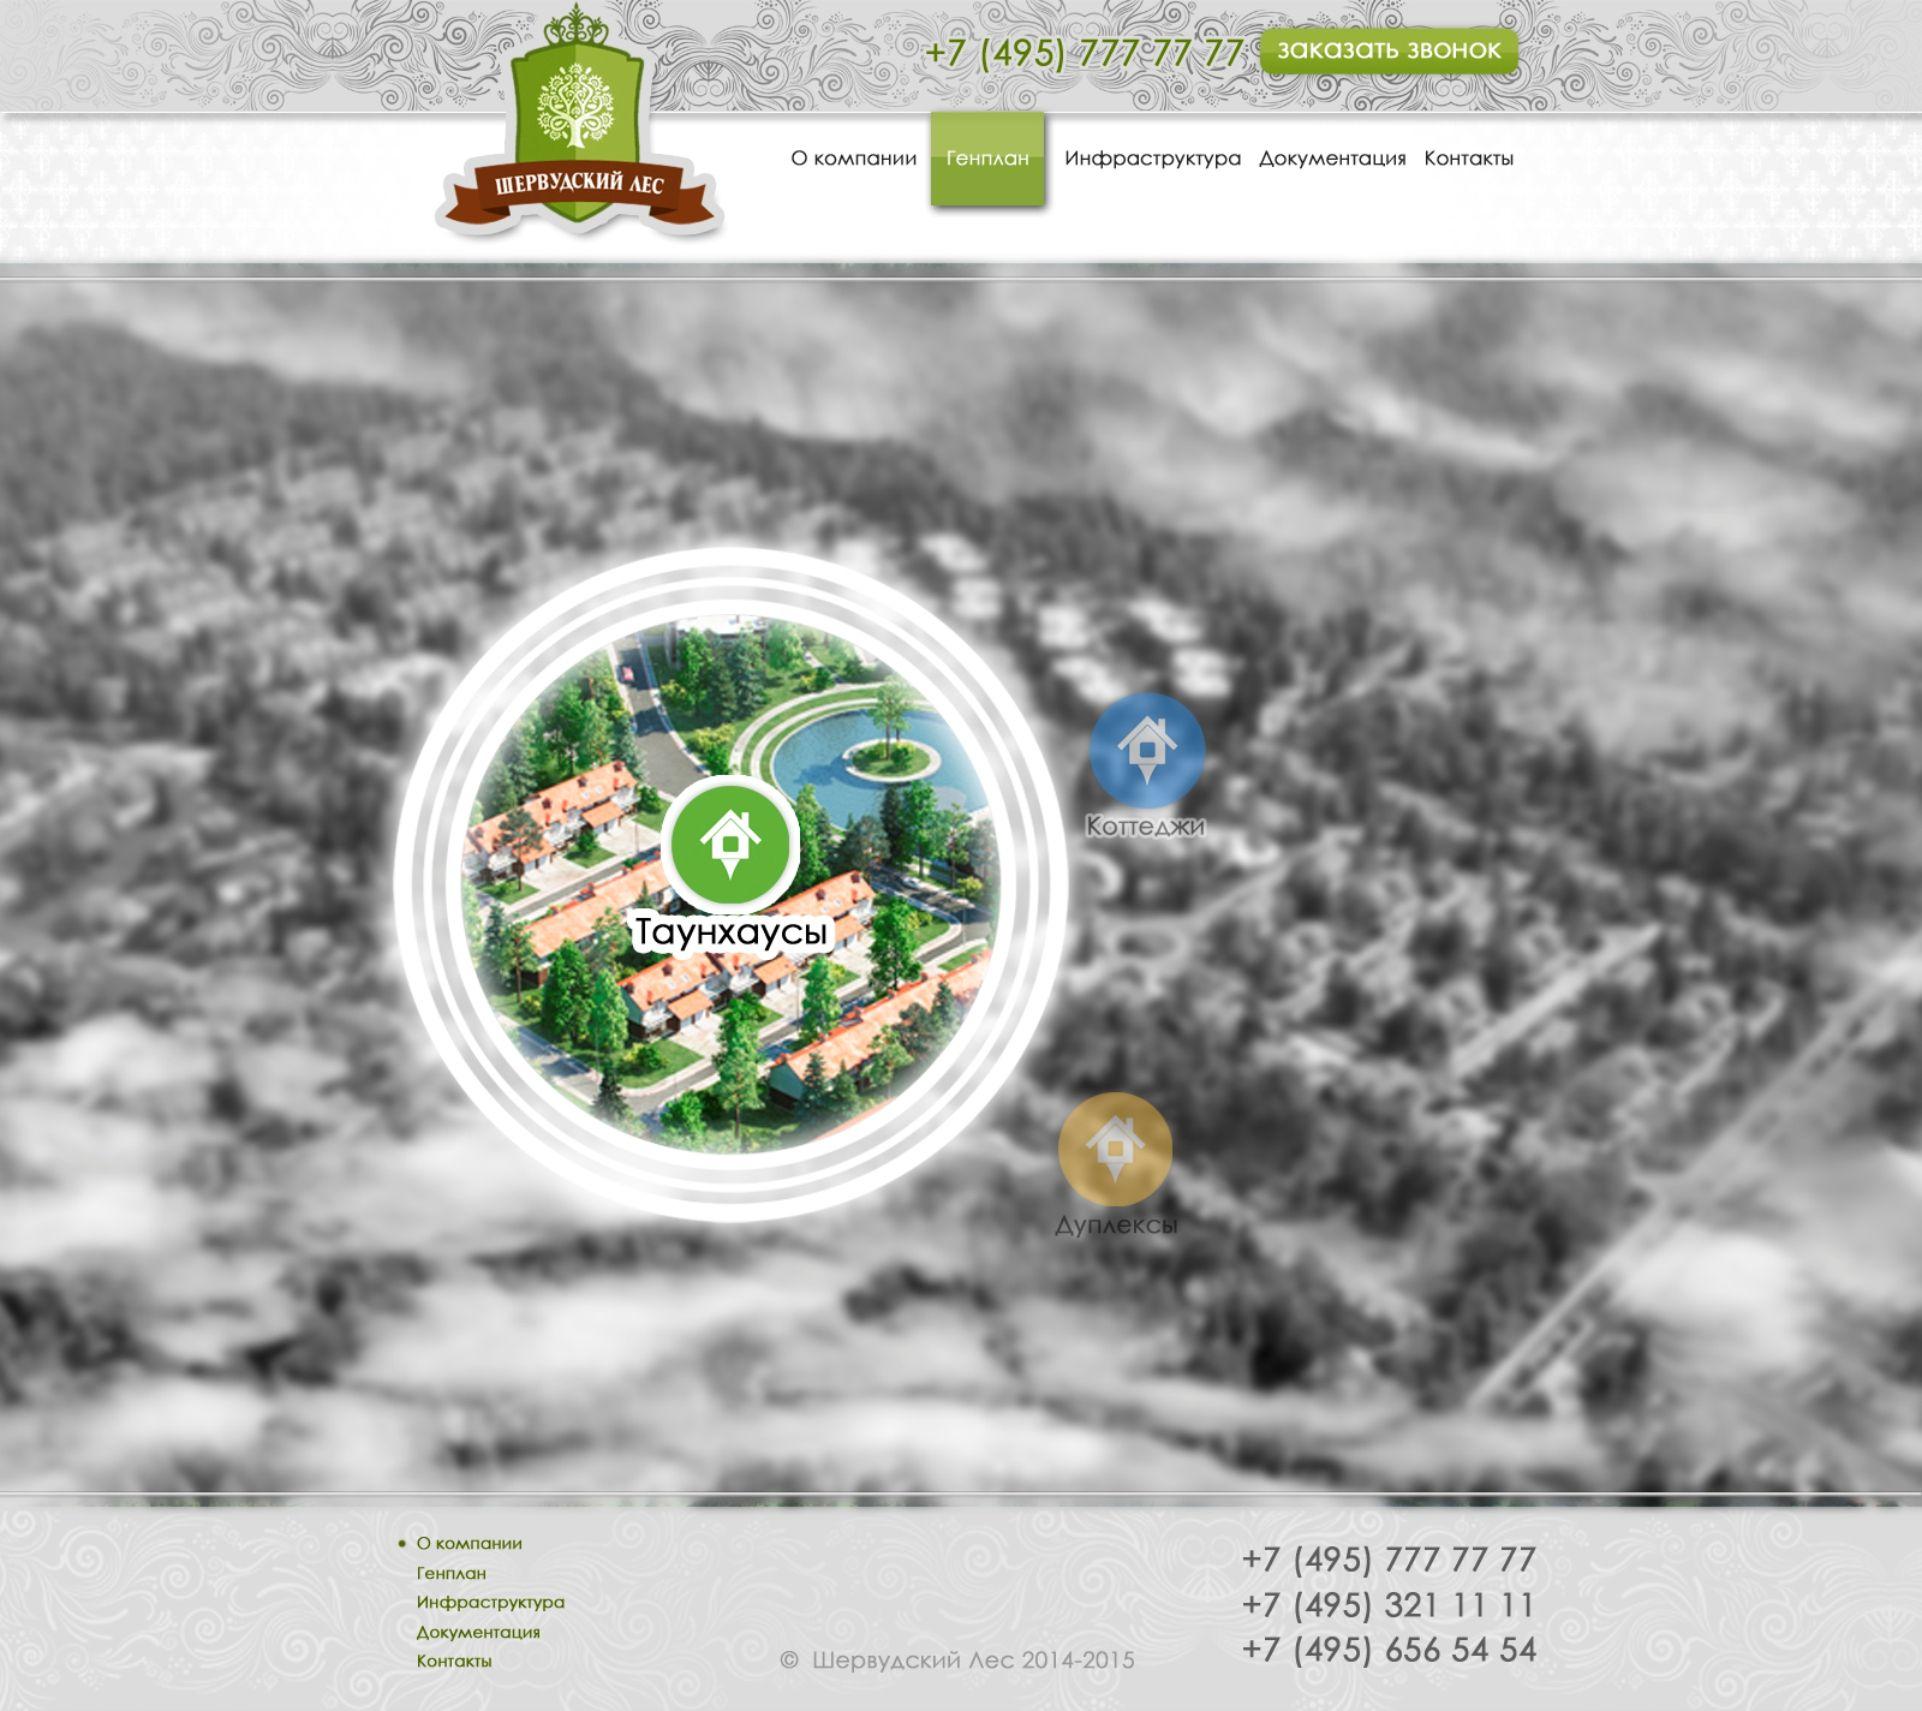 Сайт КП Шервудский Лес - дизайнер DDesign2014